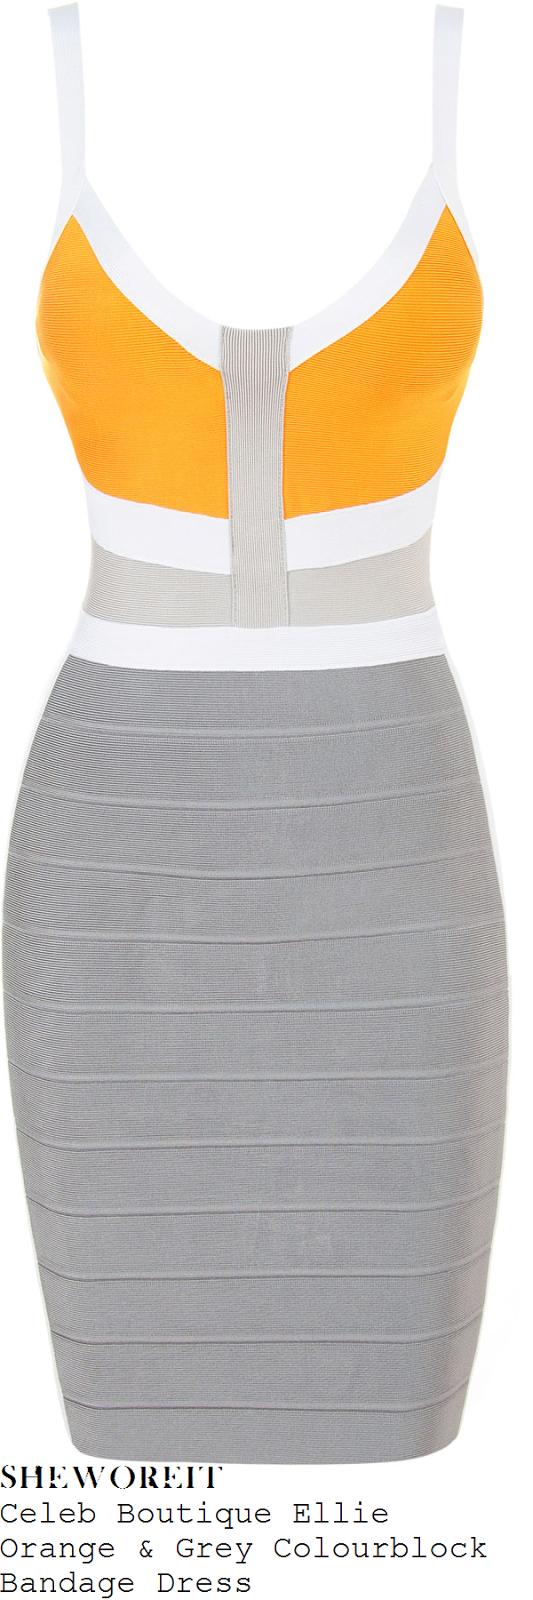 charlotte-crosby-orange-white-and-grey-bandage-dress-geordie-shore